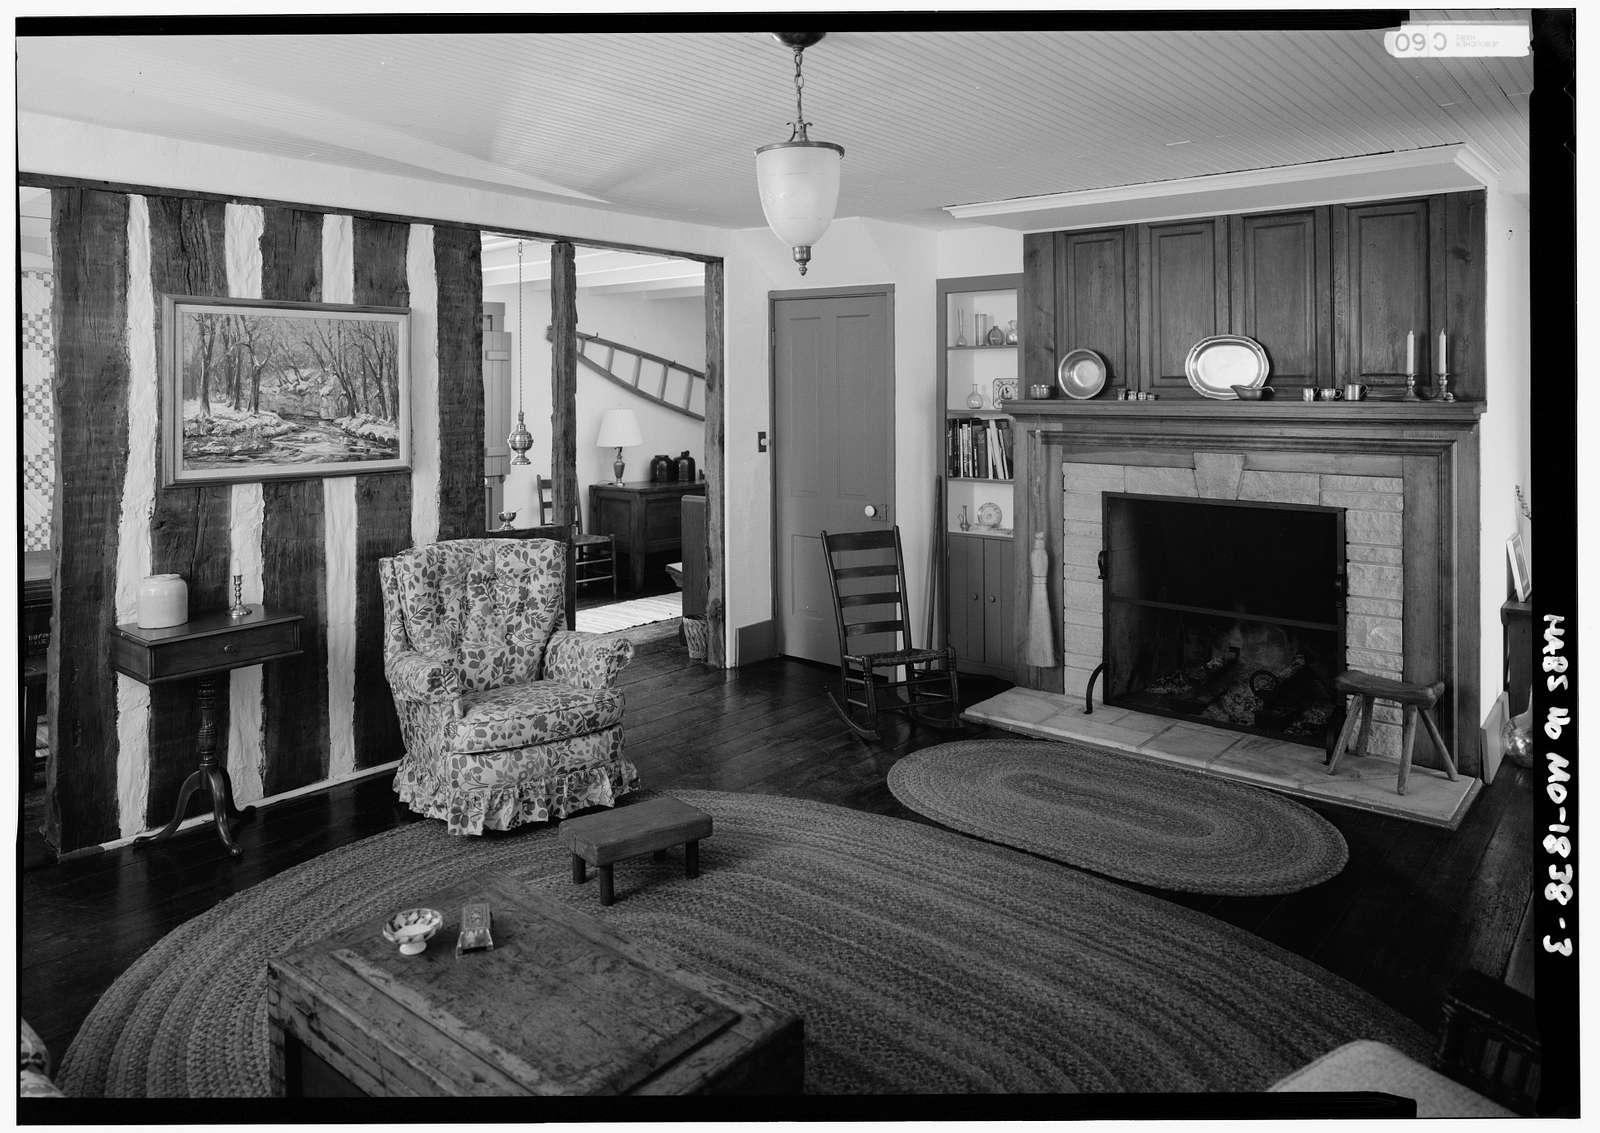 La Haye House, 704 La Porte Street, Sainte Genevieve, Ste. Genevieve County, MO